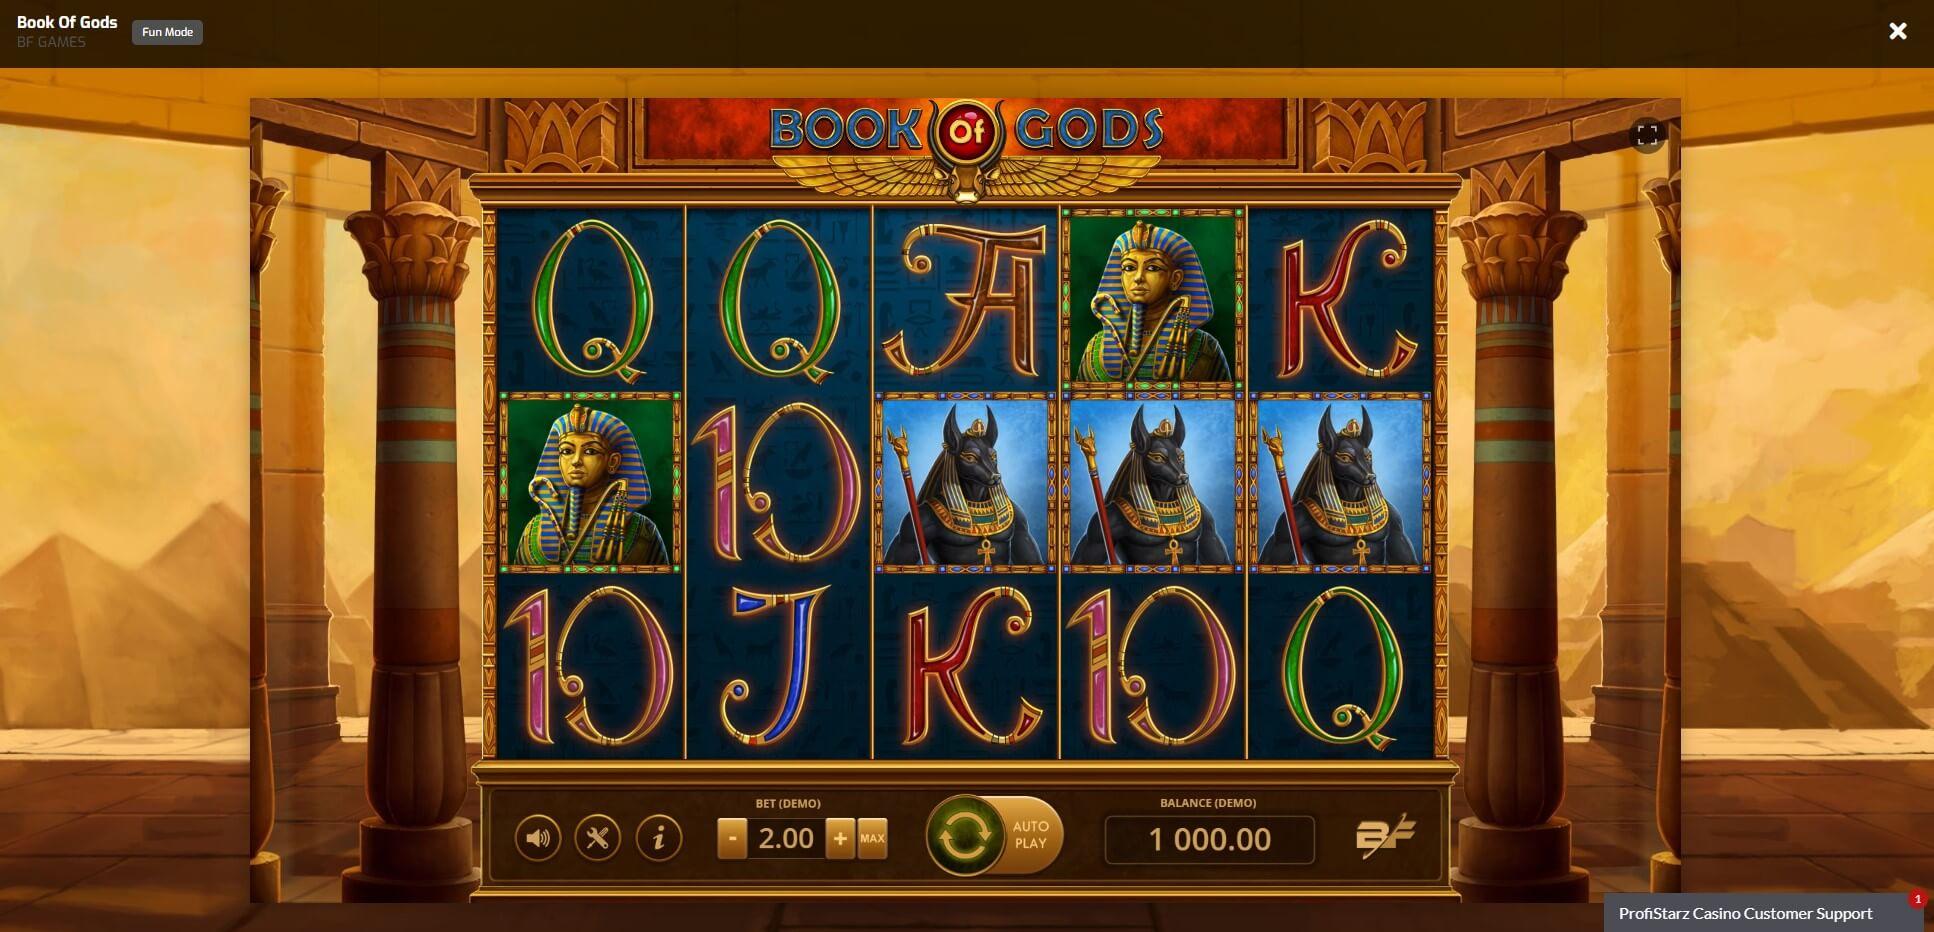 Game Play at Profistarz Casino